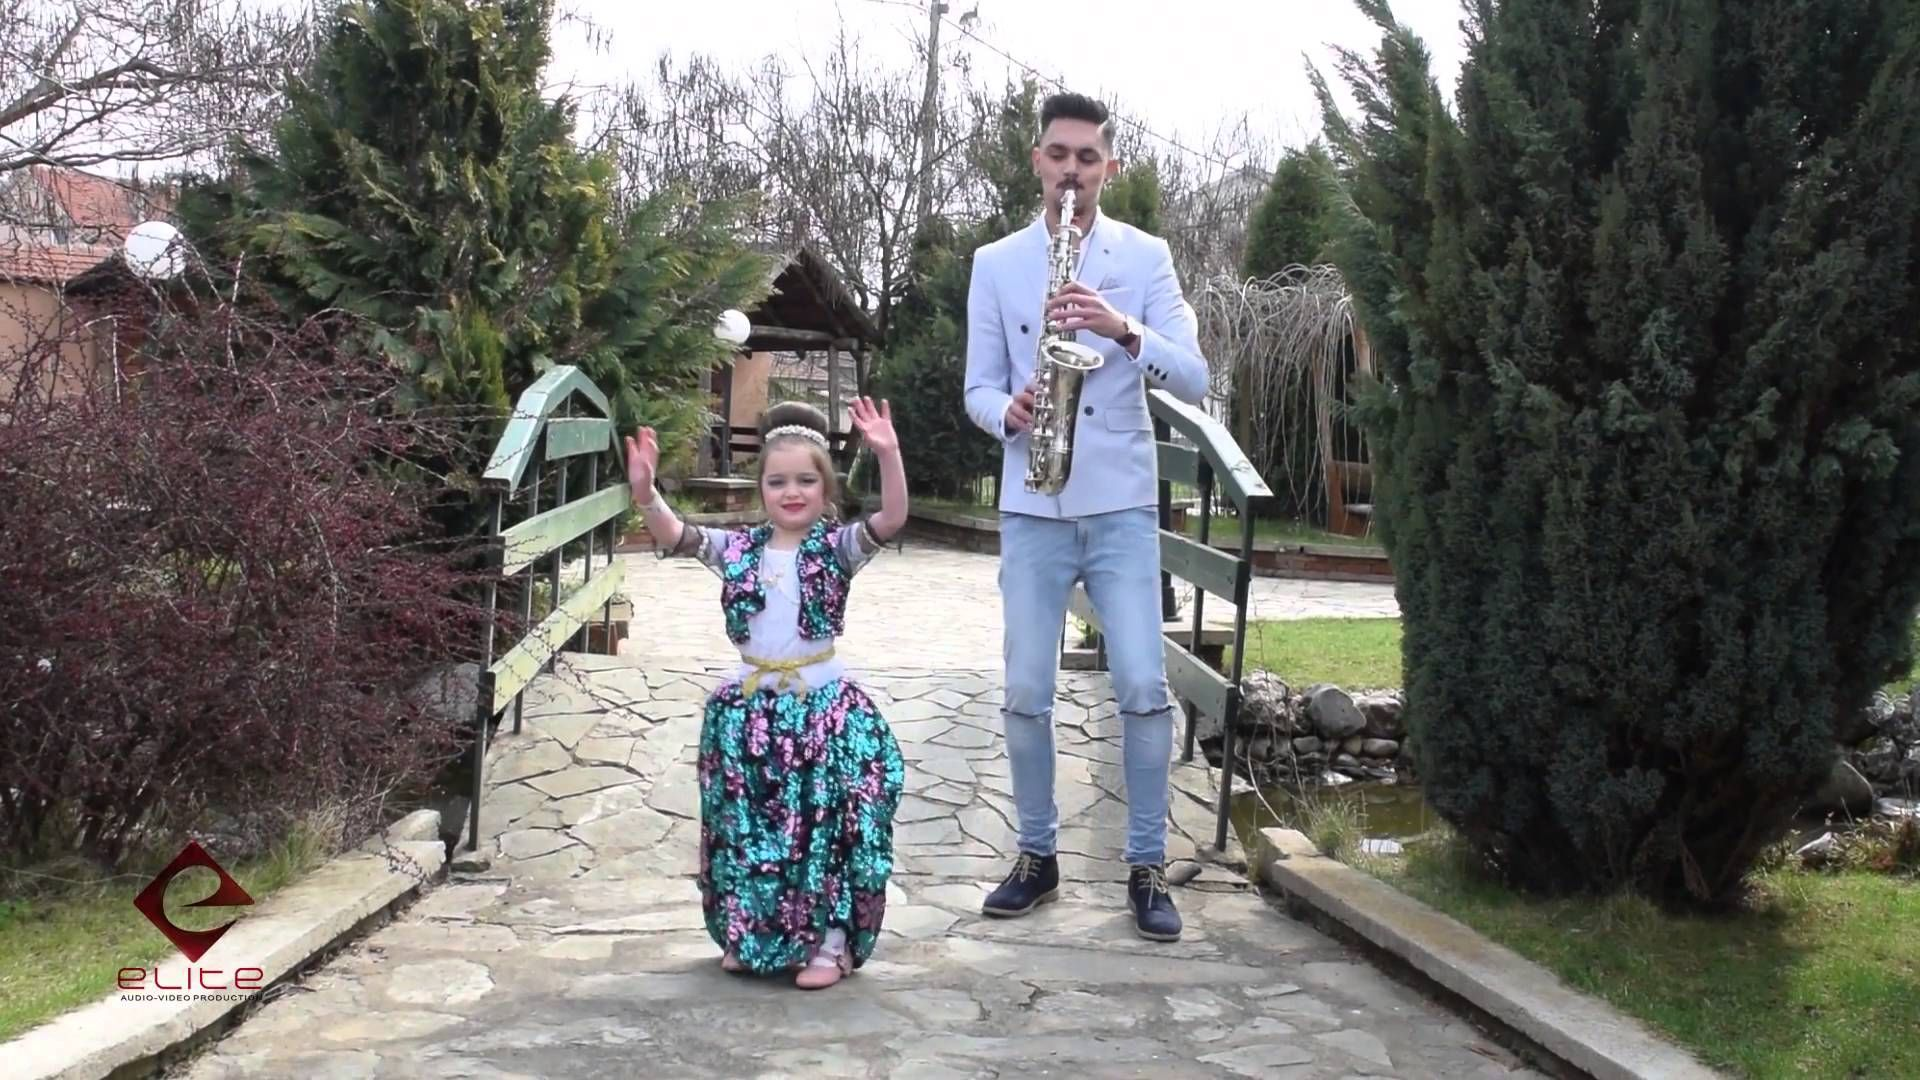 Mladi Talenti Bujanovac - ME CHIJAKO MERAKLISKO ORO - 2016 (Official Video) HD Music Video Posted on http://musicvideopalace.com/mladi-talenti-bujanovac-me-chijako-meraklisko-oro-2016-official-video-hd/